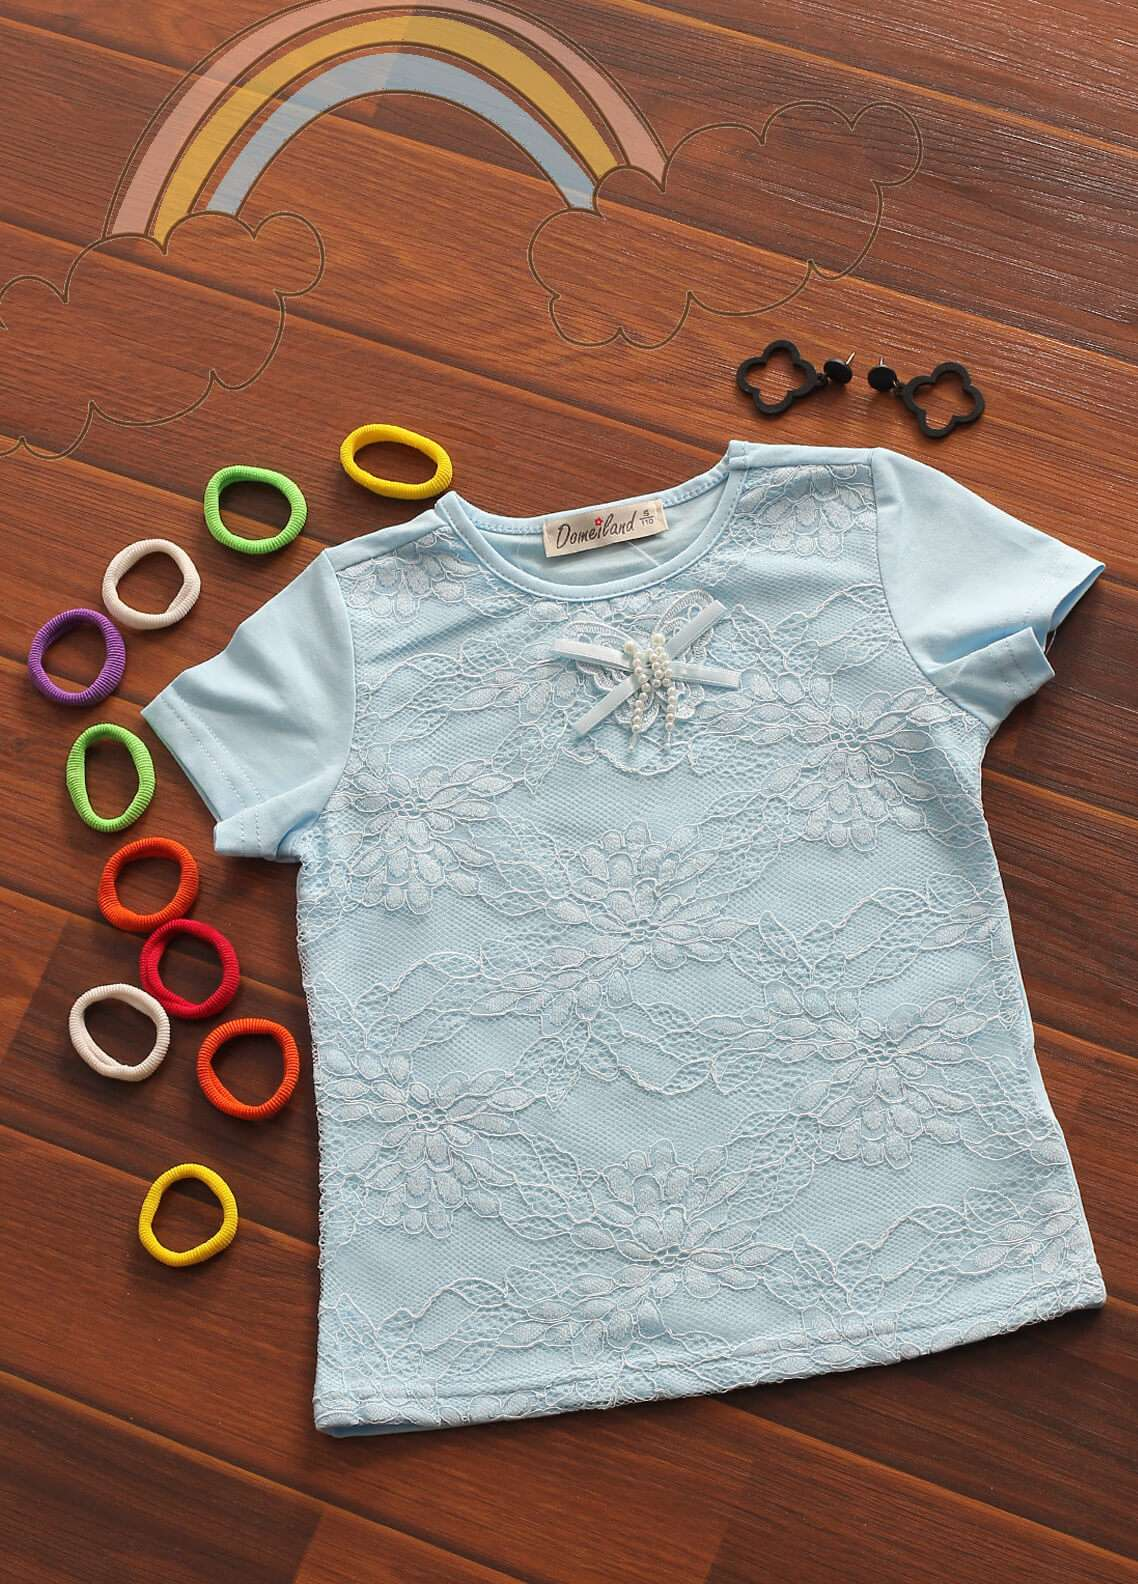 Sanaulla Exclusive Range Cotton Fancy Tees for Girls -  802580 Sky Blue